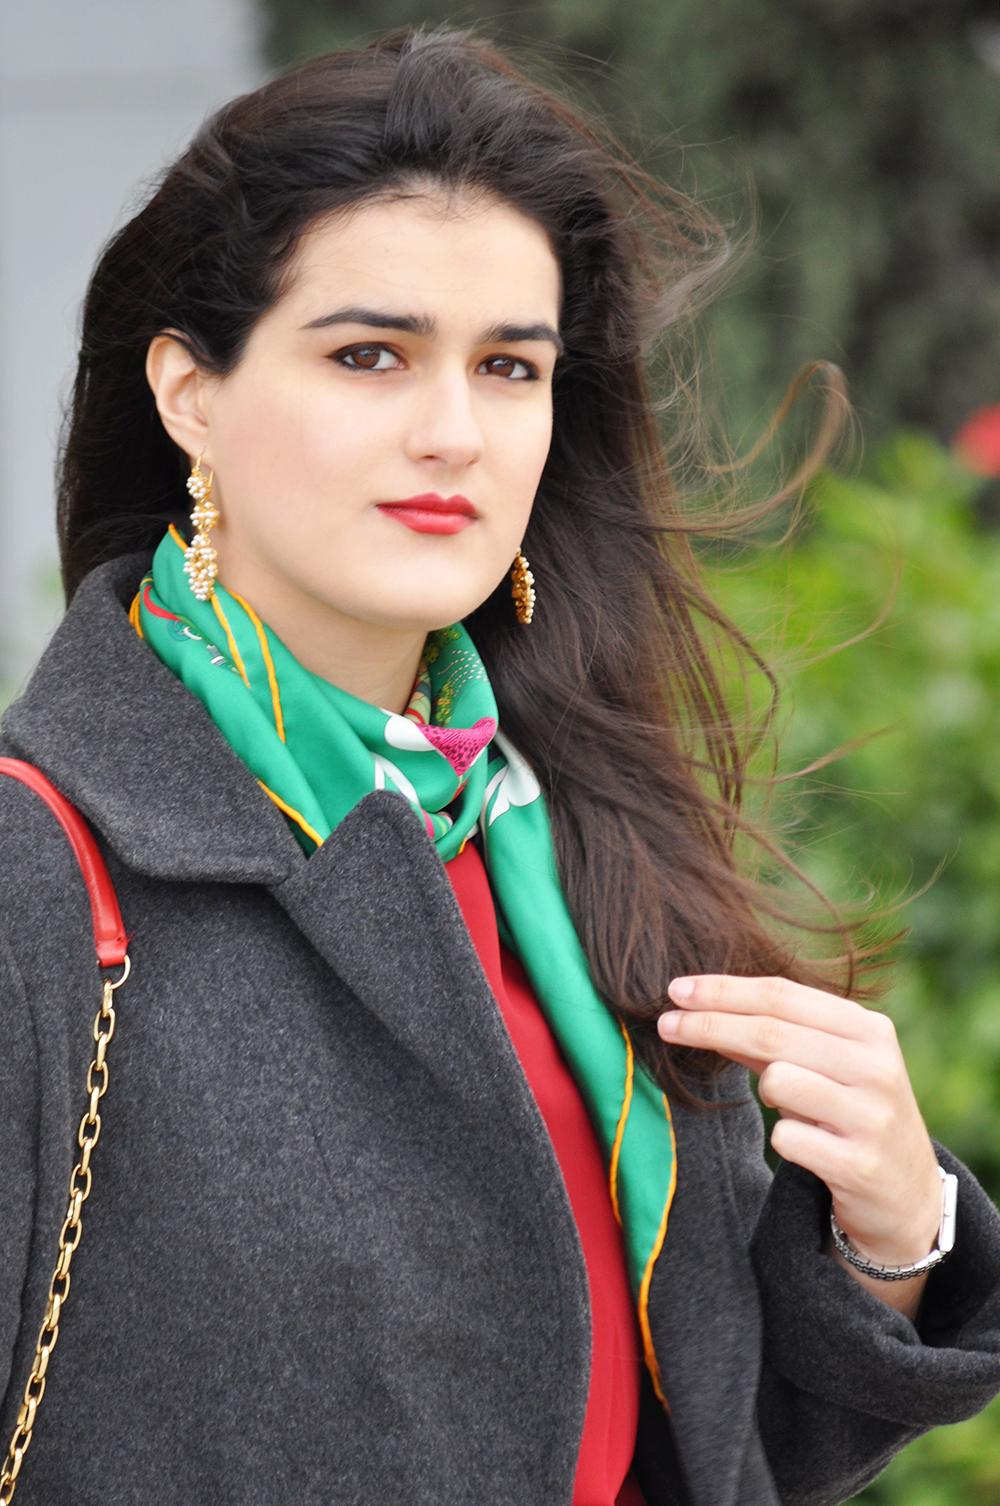 valencia spain spanish fashionista fashionblogger somethingfashion hermes carre scarf christmas holiday outfit ideas streetstyle_0052 copia